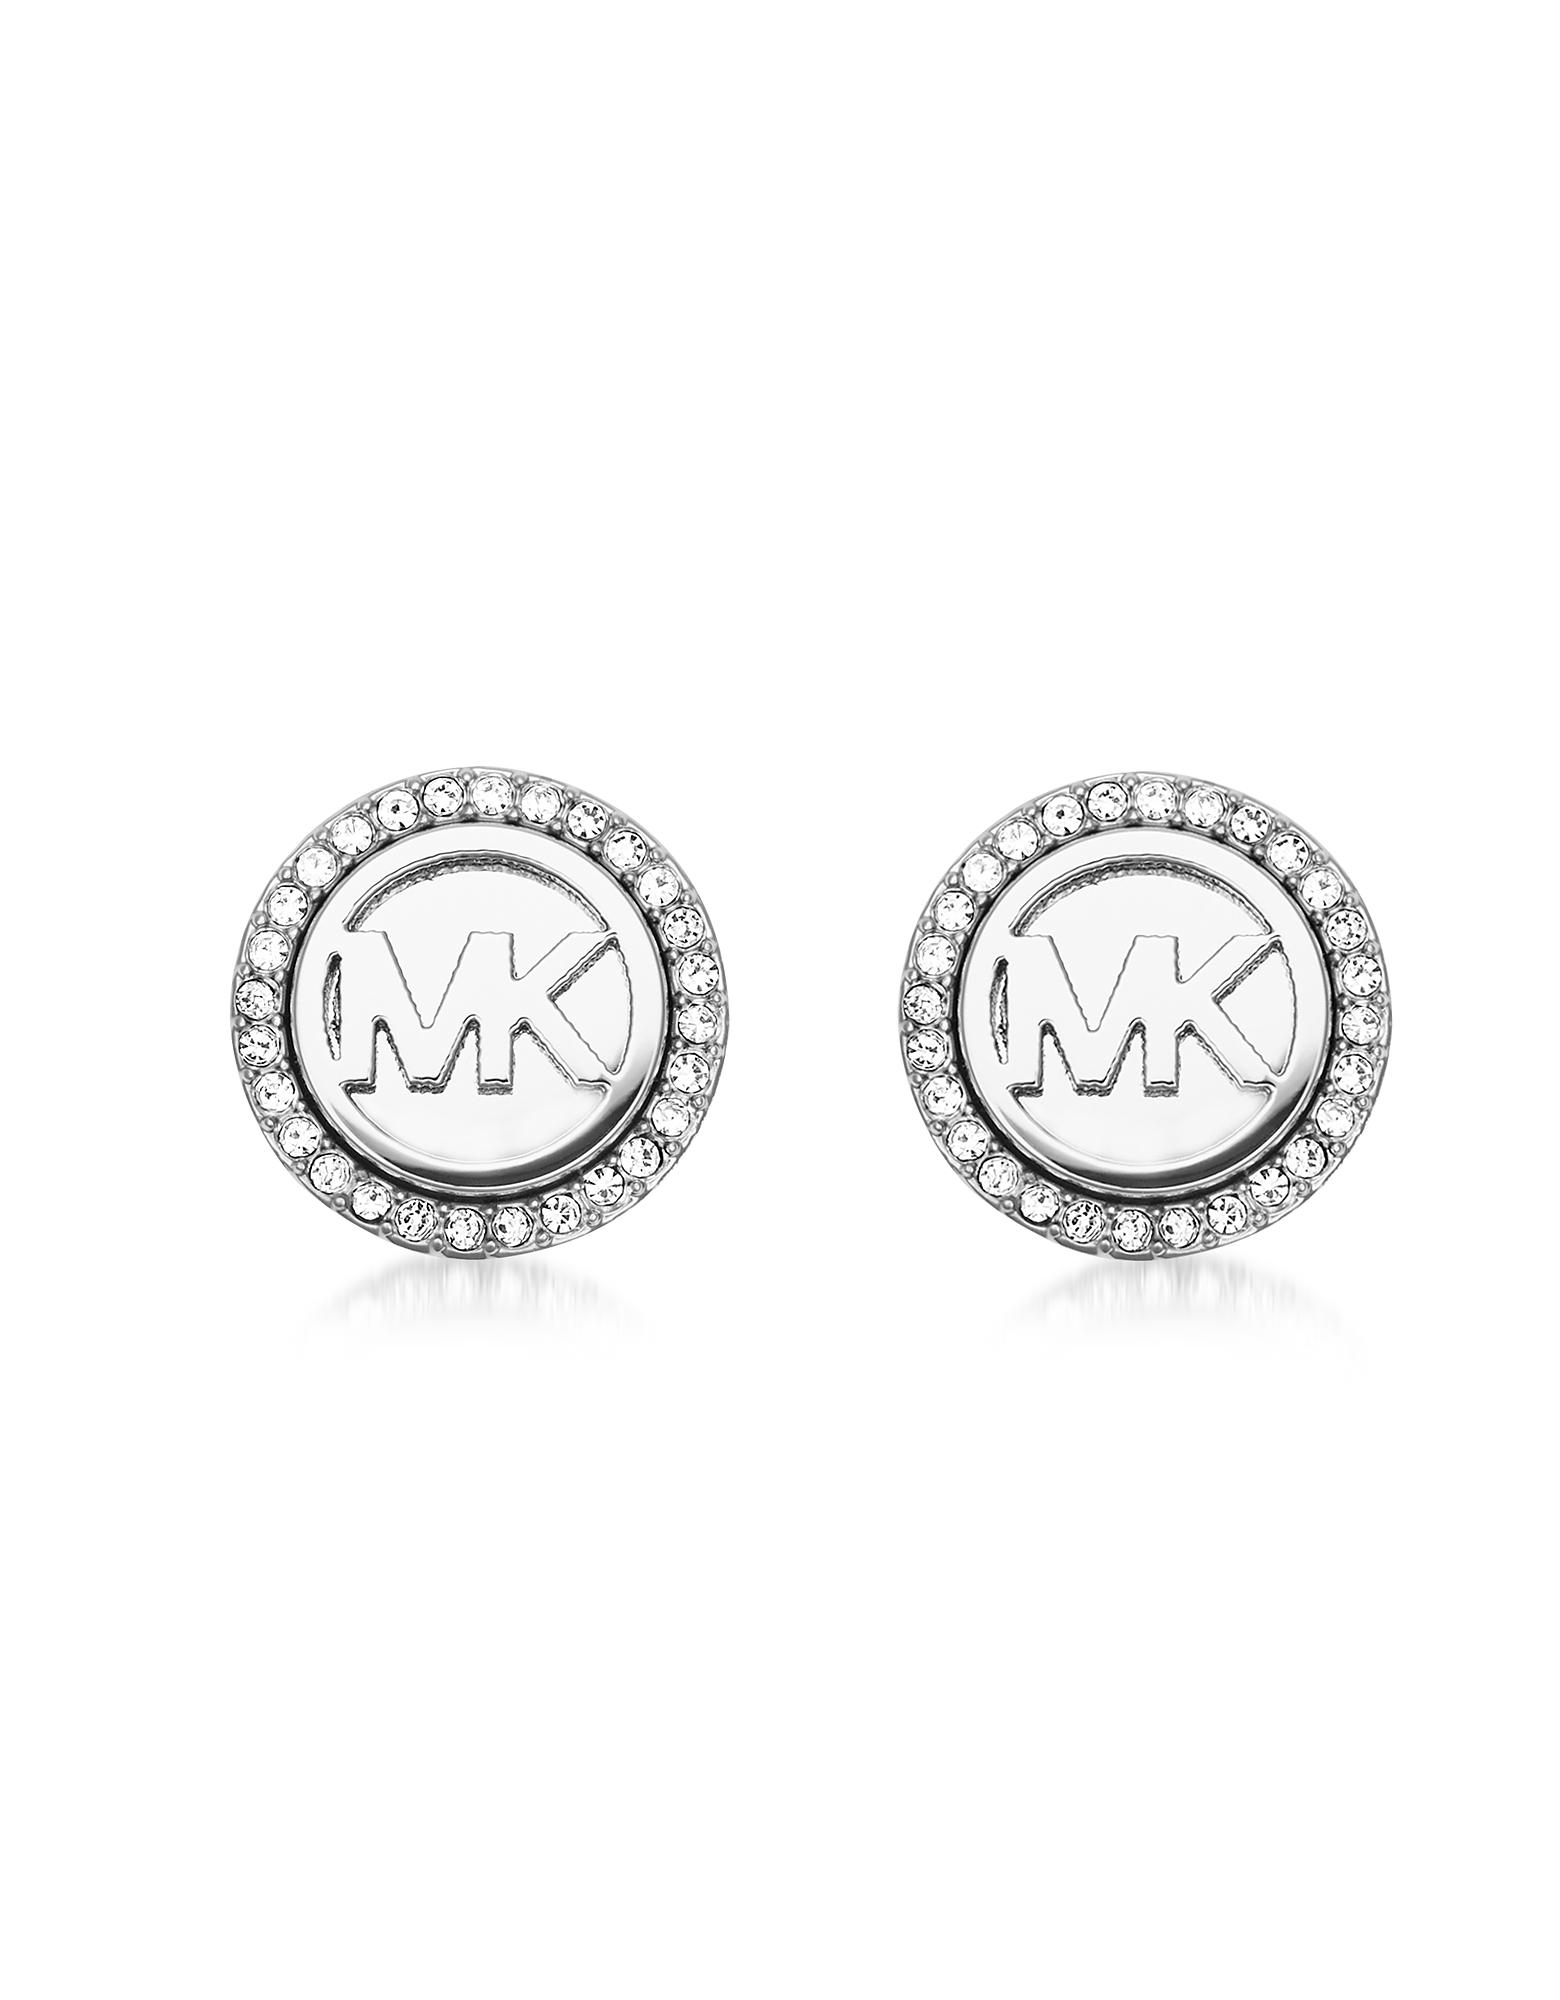 Michael Kors Earrings, Logo Silvertone Stainless Steel Stud Earrings